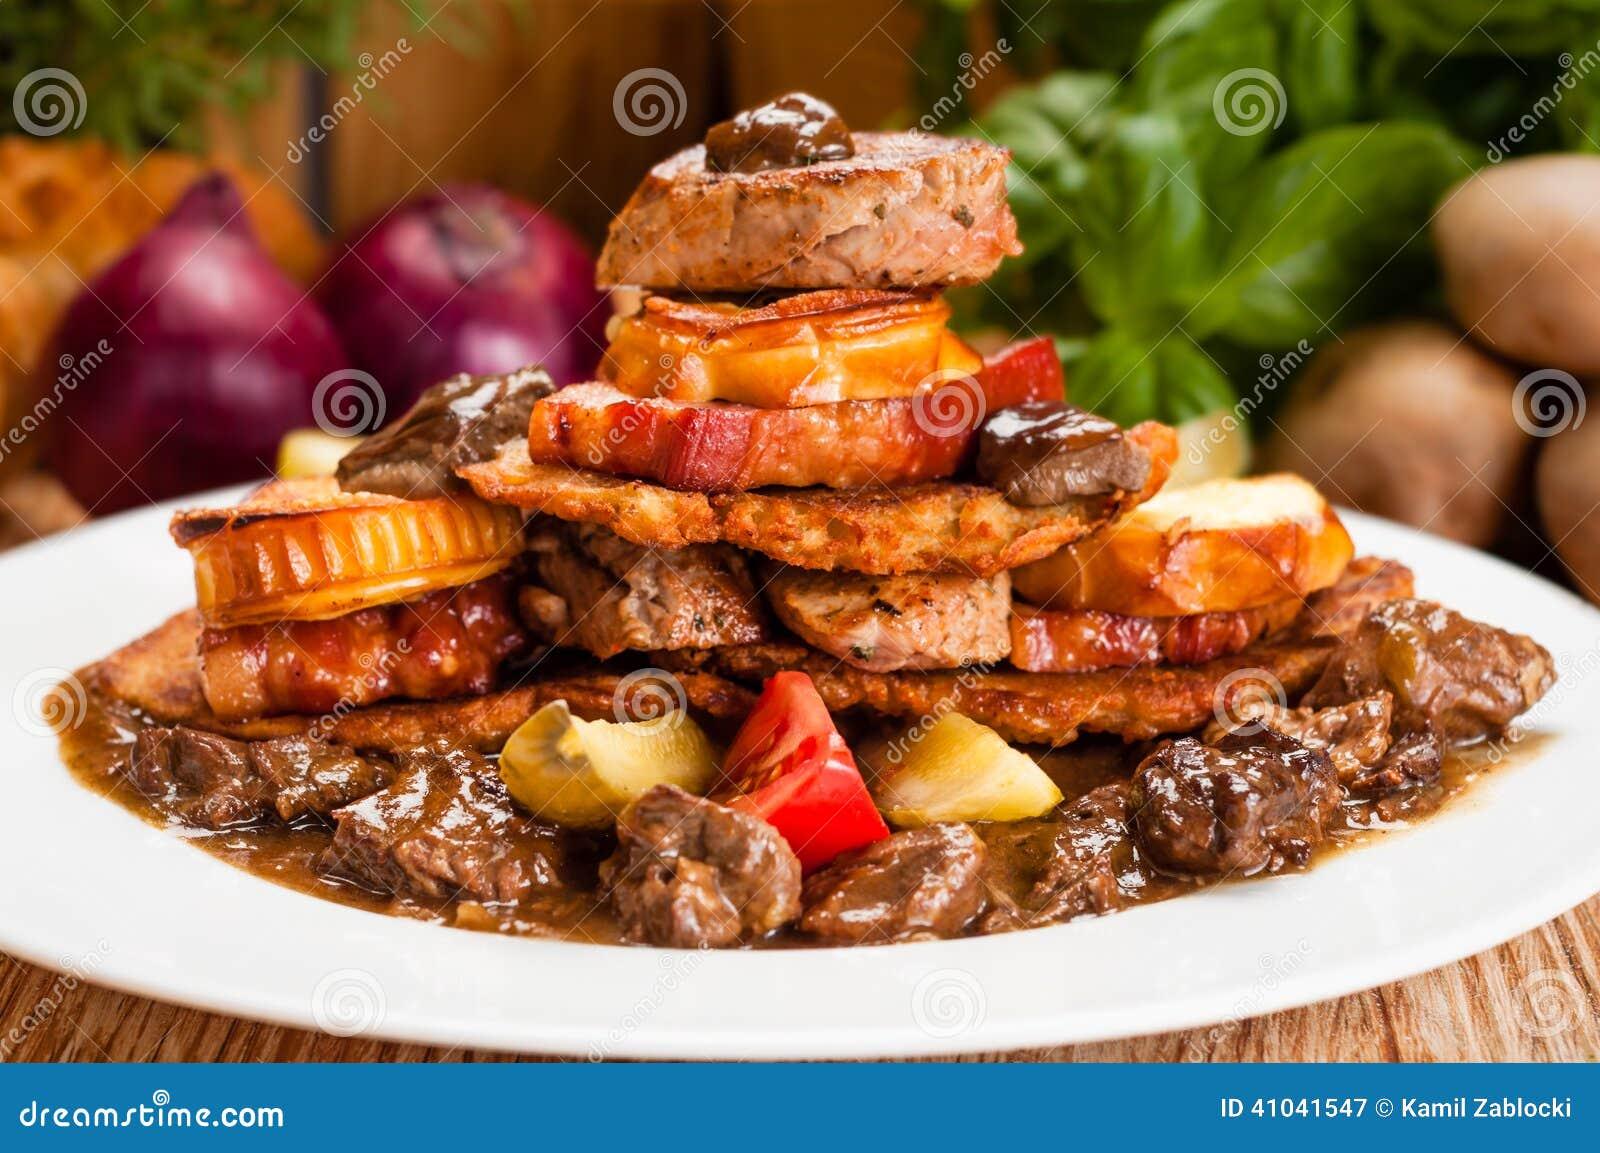 nourriture malsaine grasse image stock image du potato 41041547. Black Bedroom Furniture Sets. Home Design Ideas